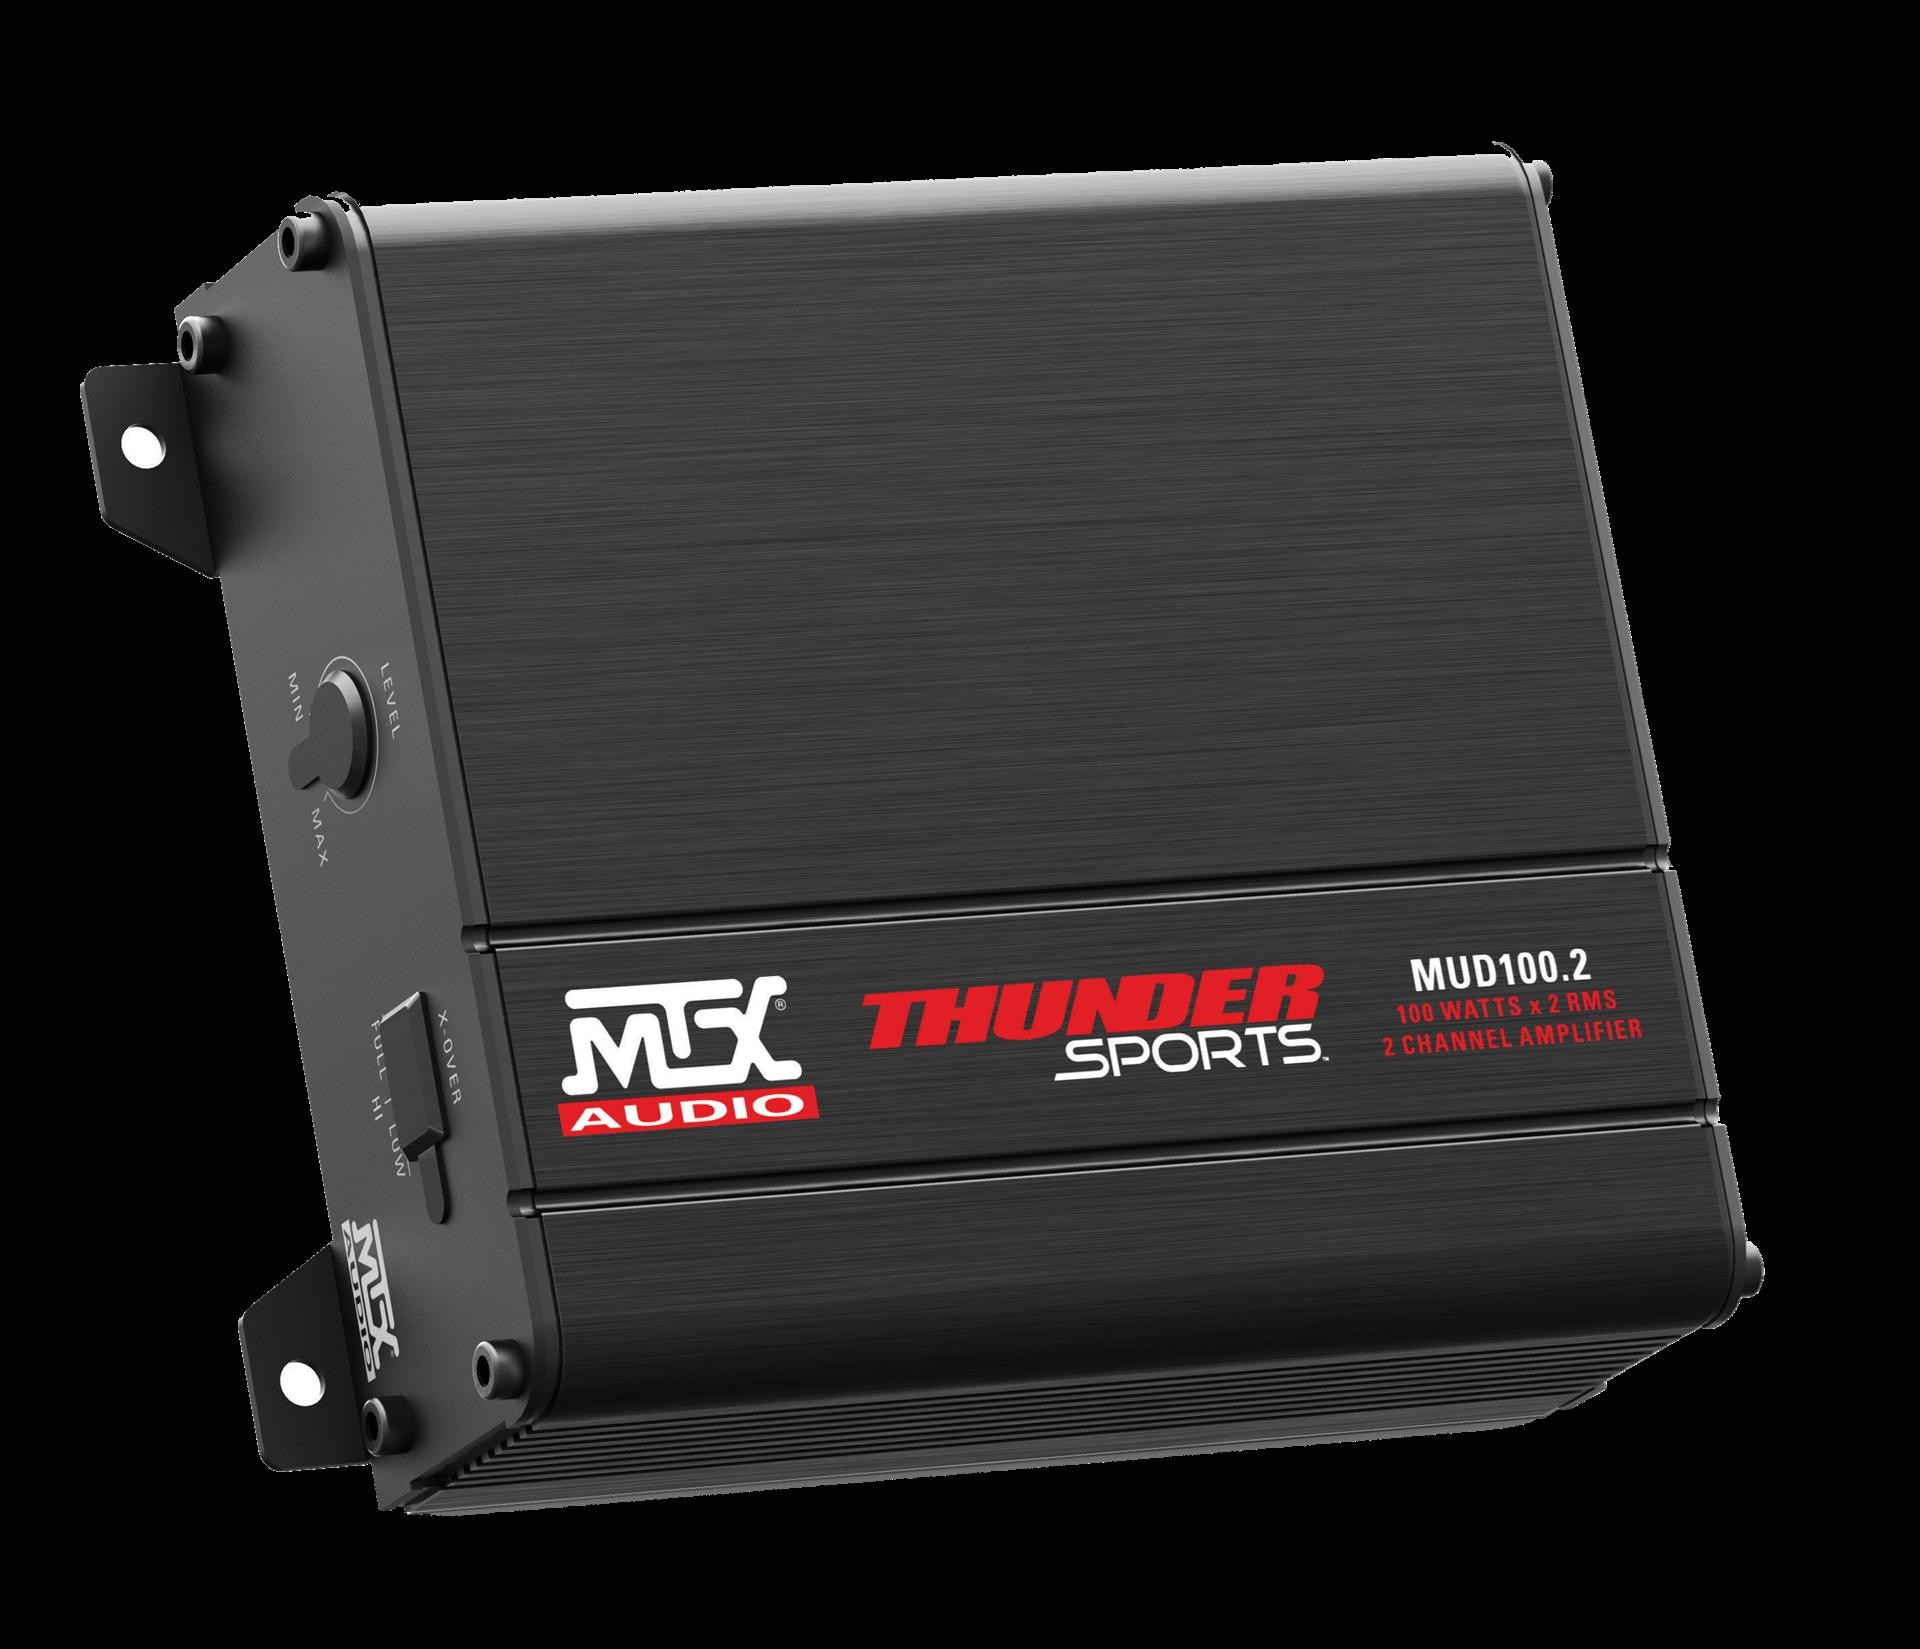 Rangersystem3 Level 2 Complete Audio System For Polaris Ranger Amplifier Sku